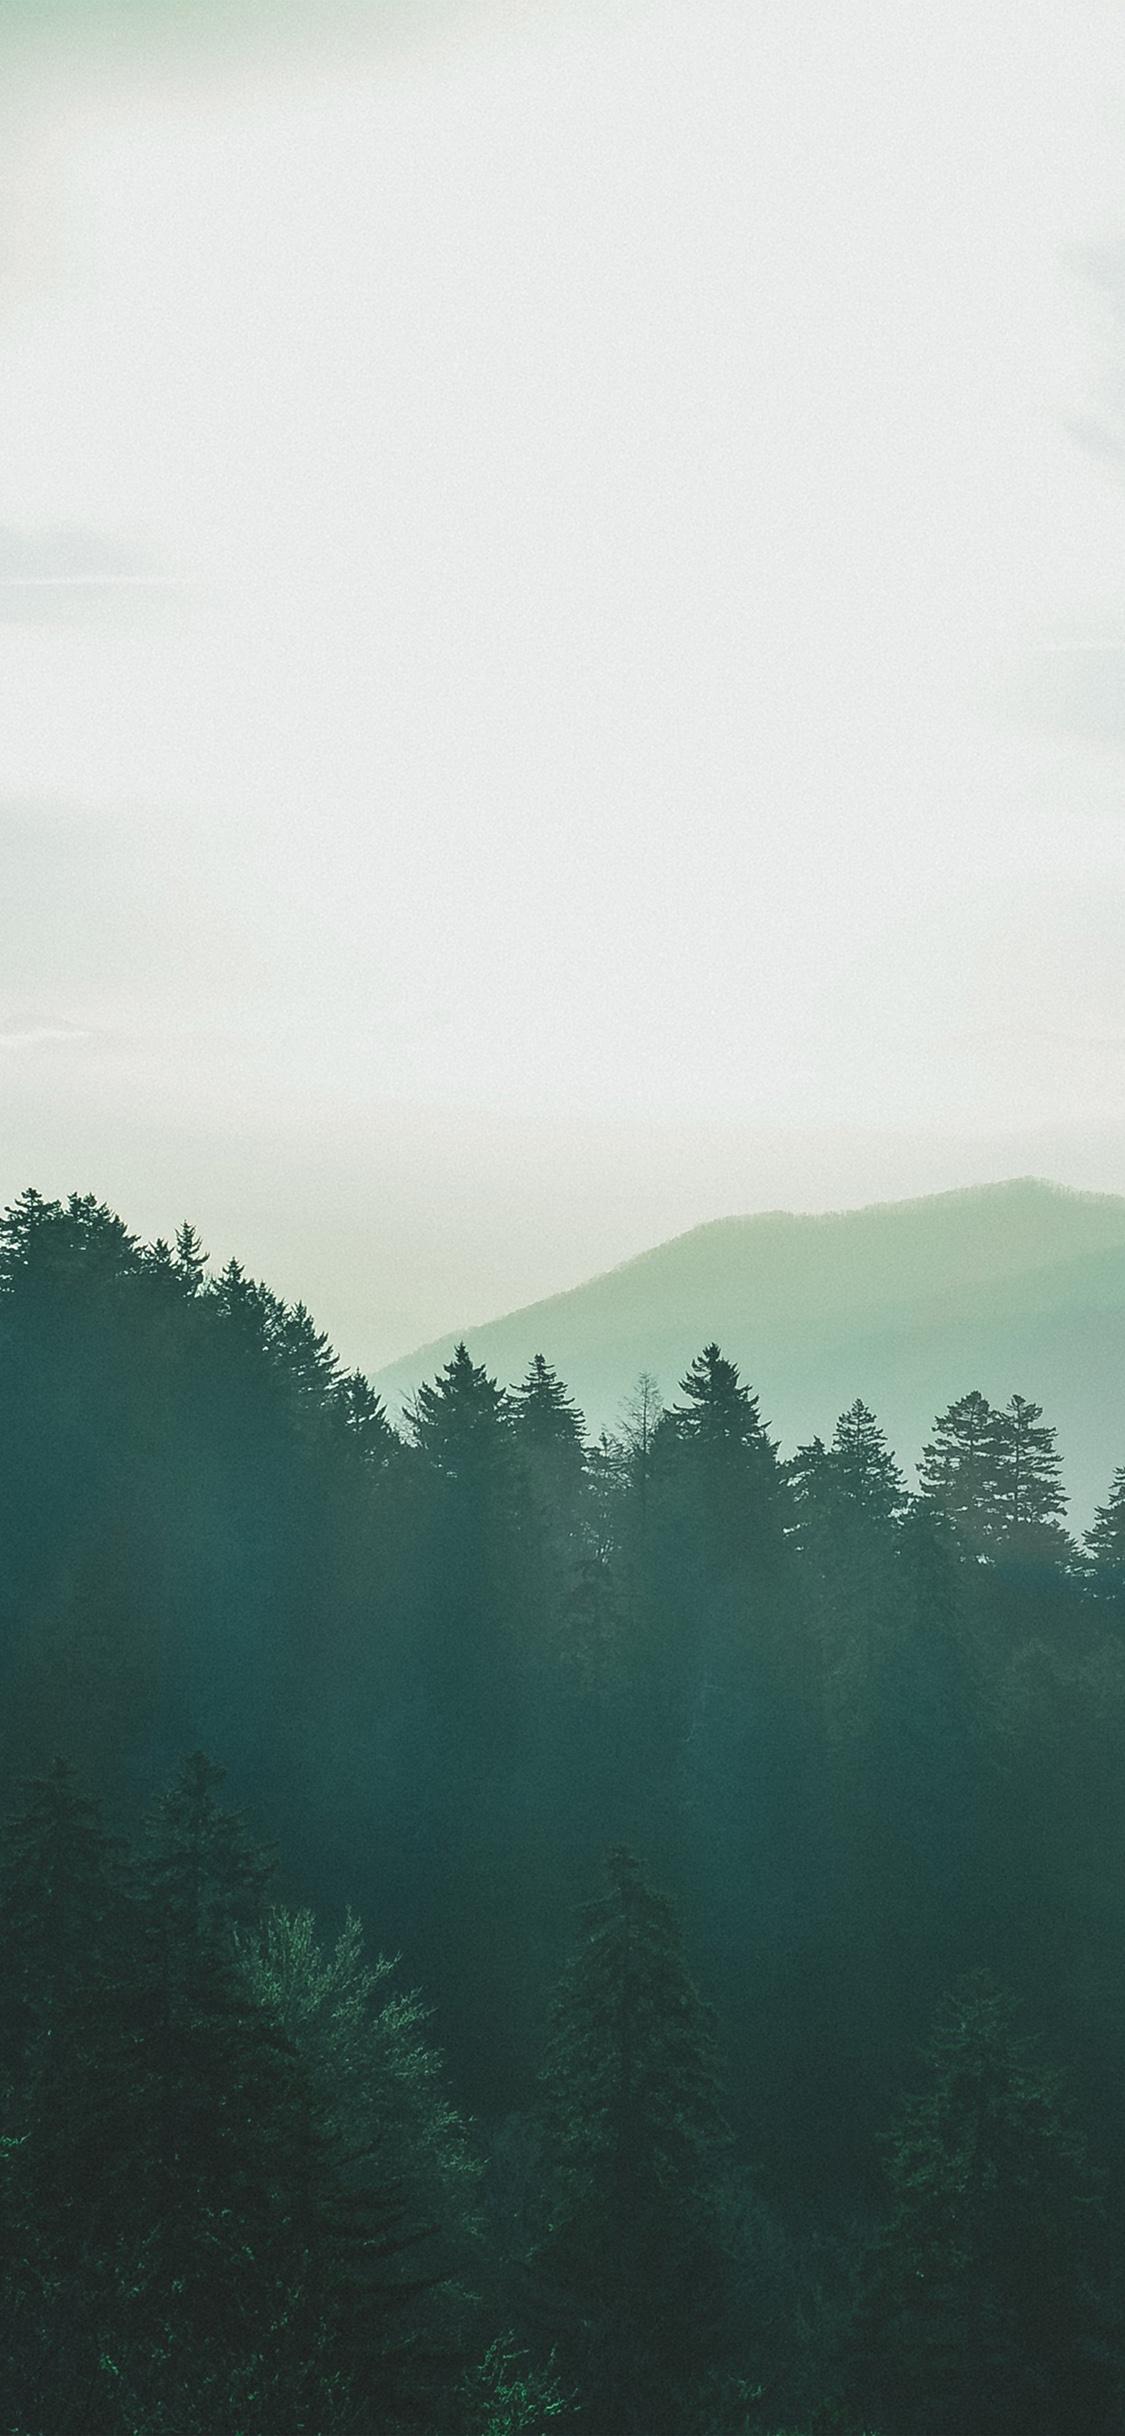 Nq14 Sunny Day Mountain Green Nature Wallpaper